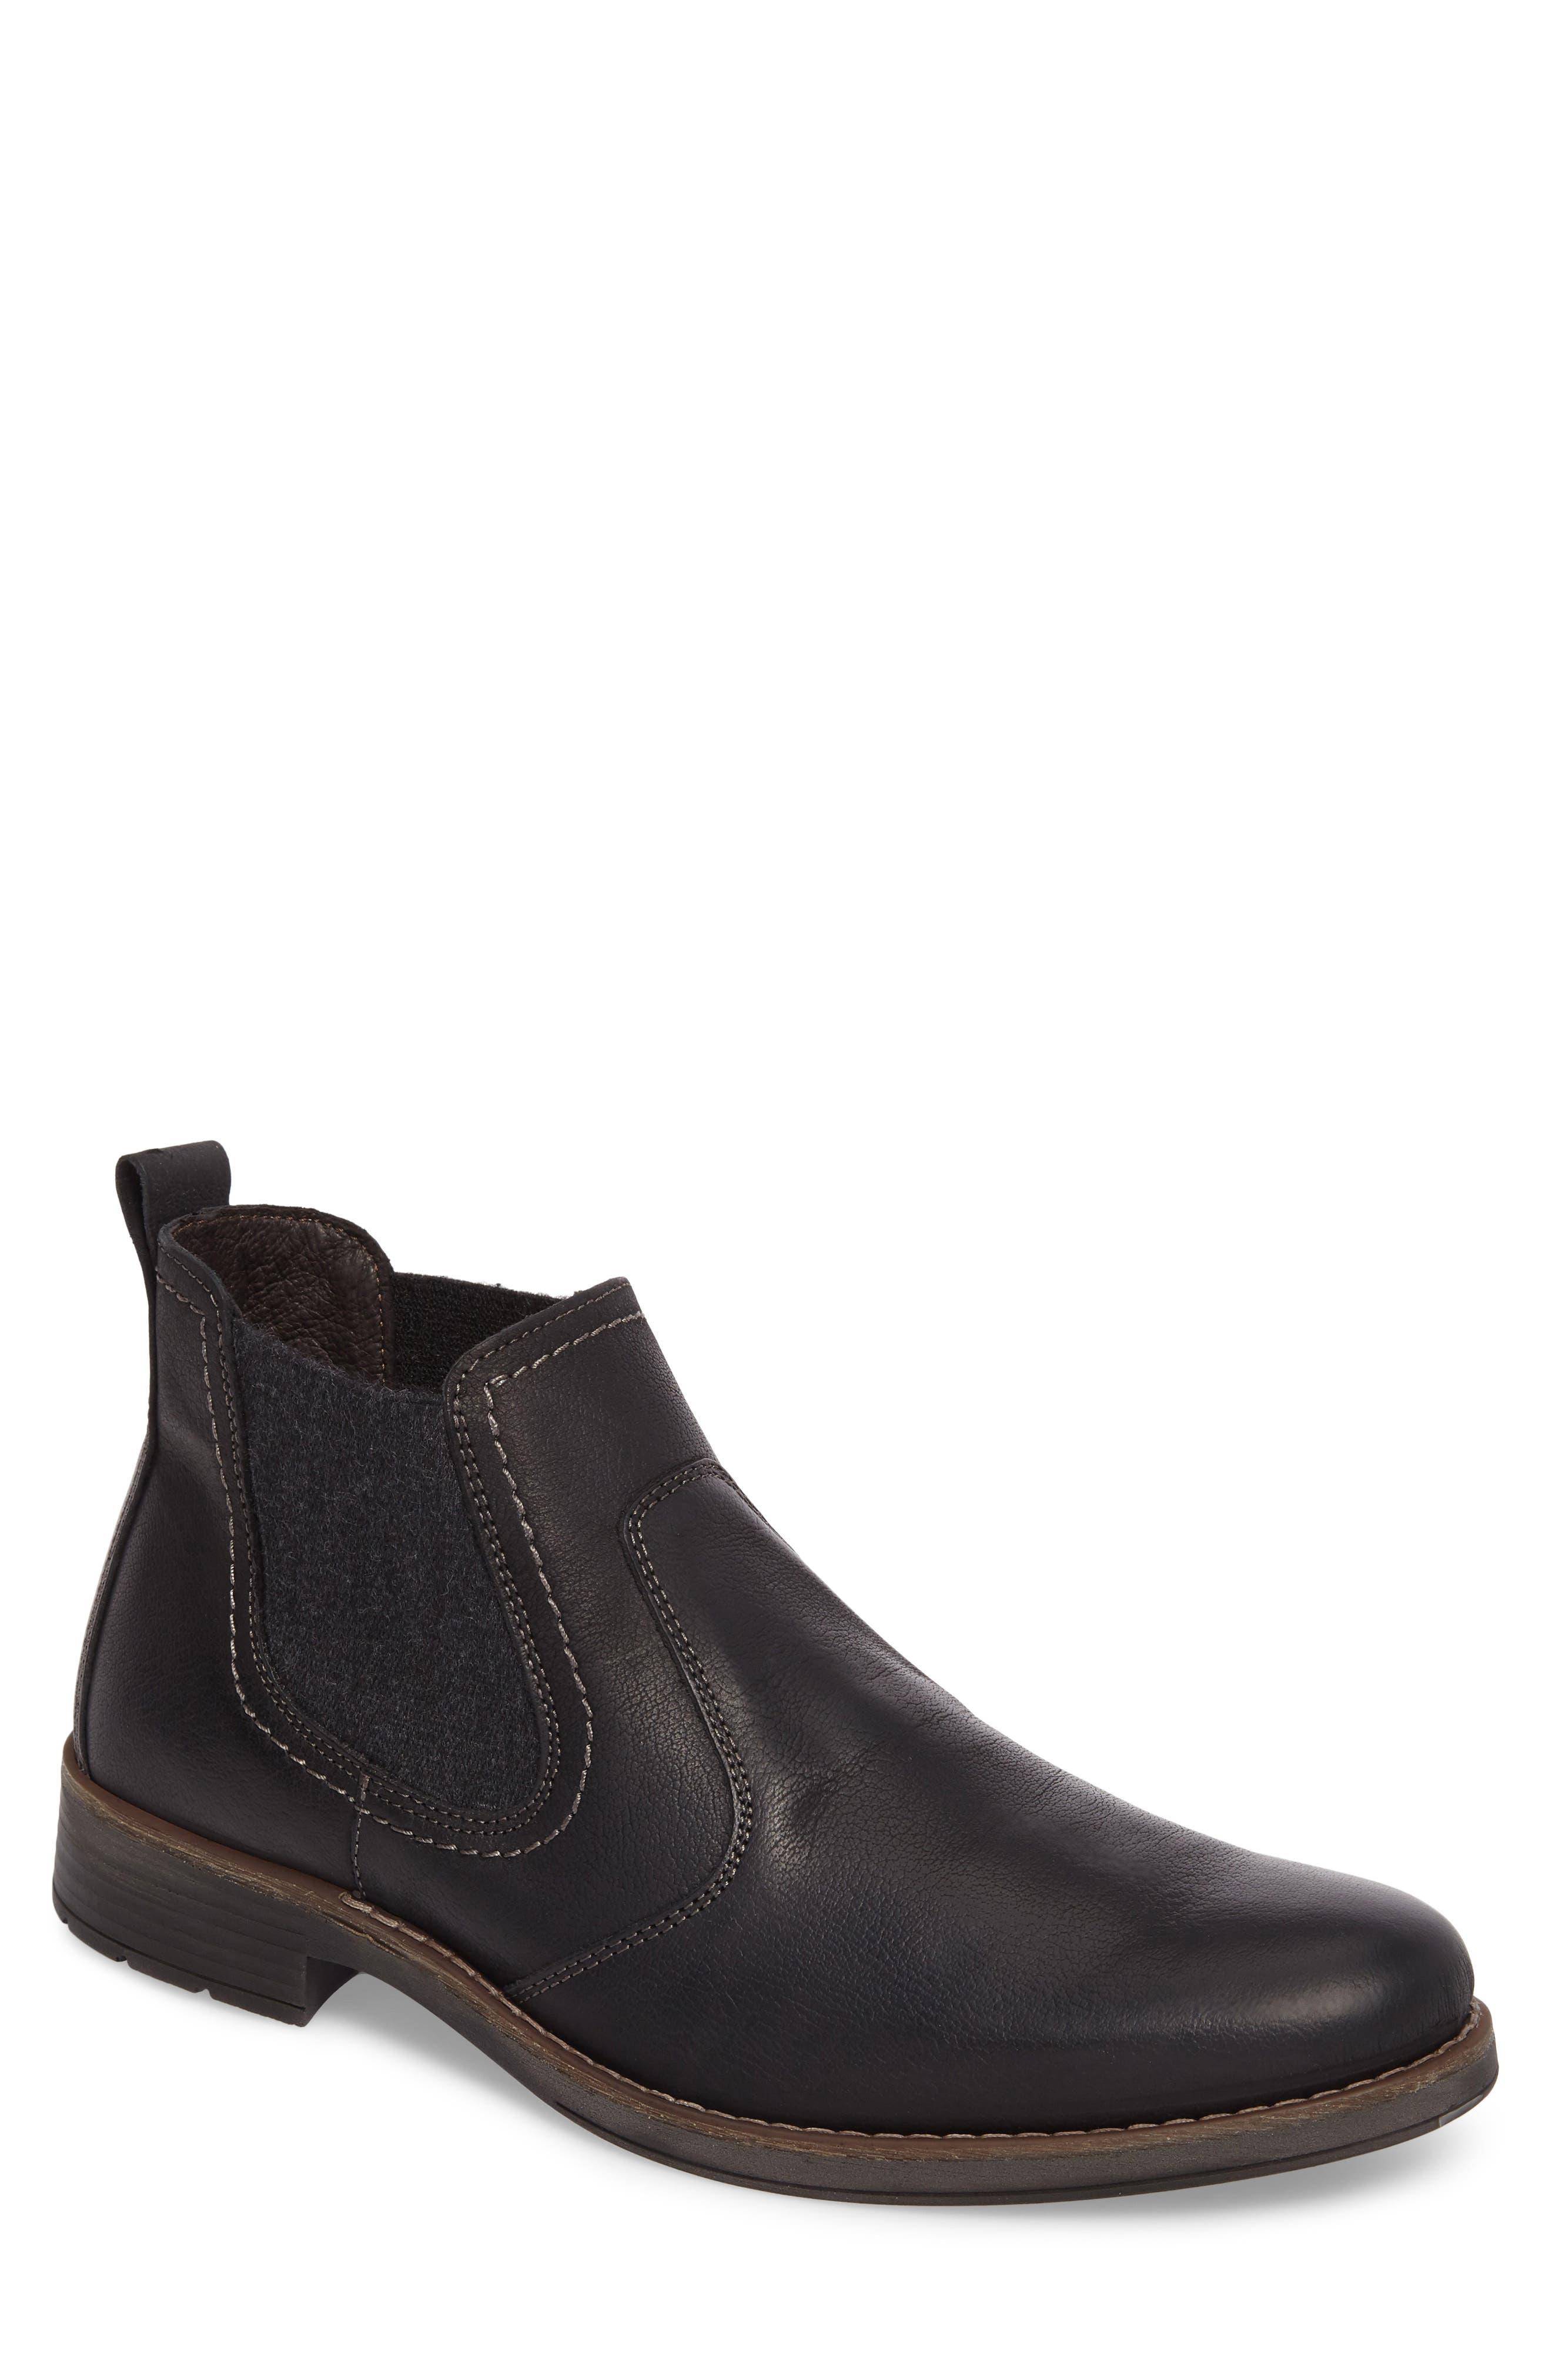 Spokane Chelsea Boot,                         Main,                         color, Black Leather